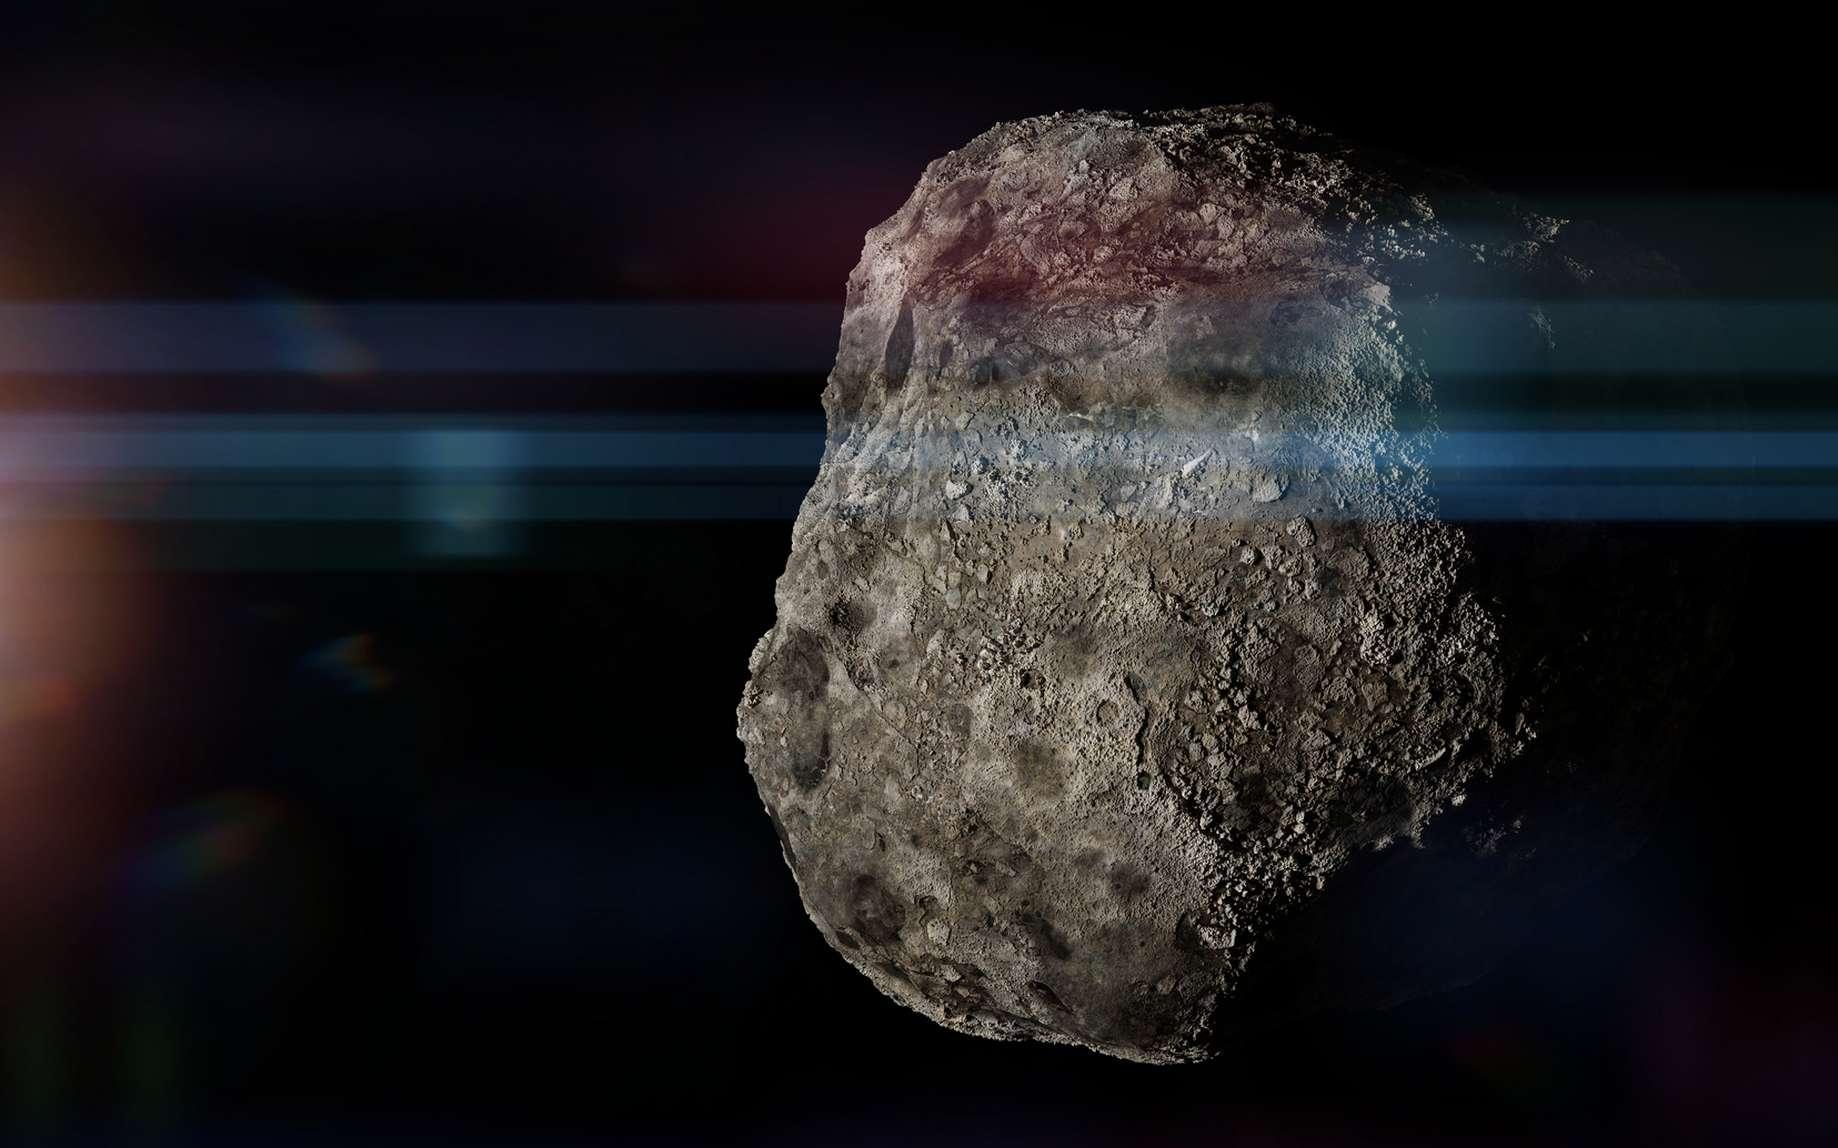 Illustration d'un astéroïde. © dottedyeti, fotolia